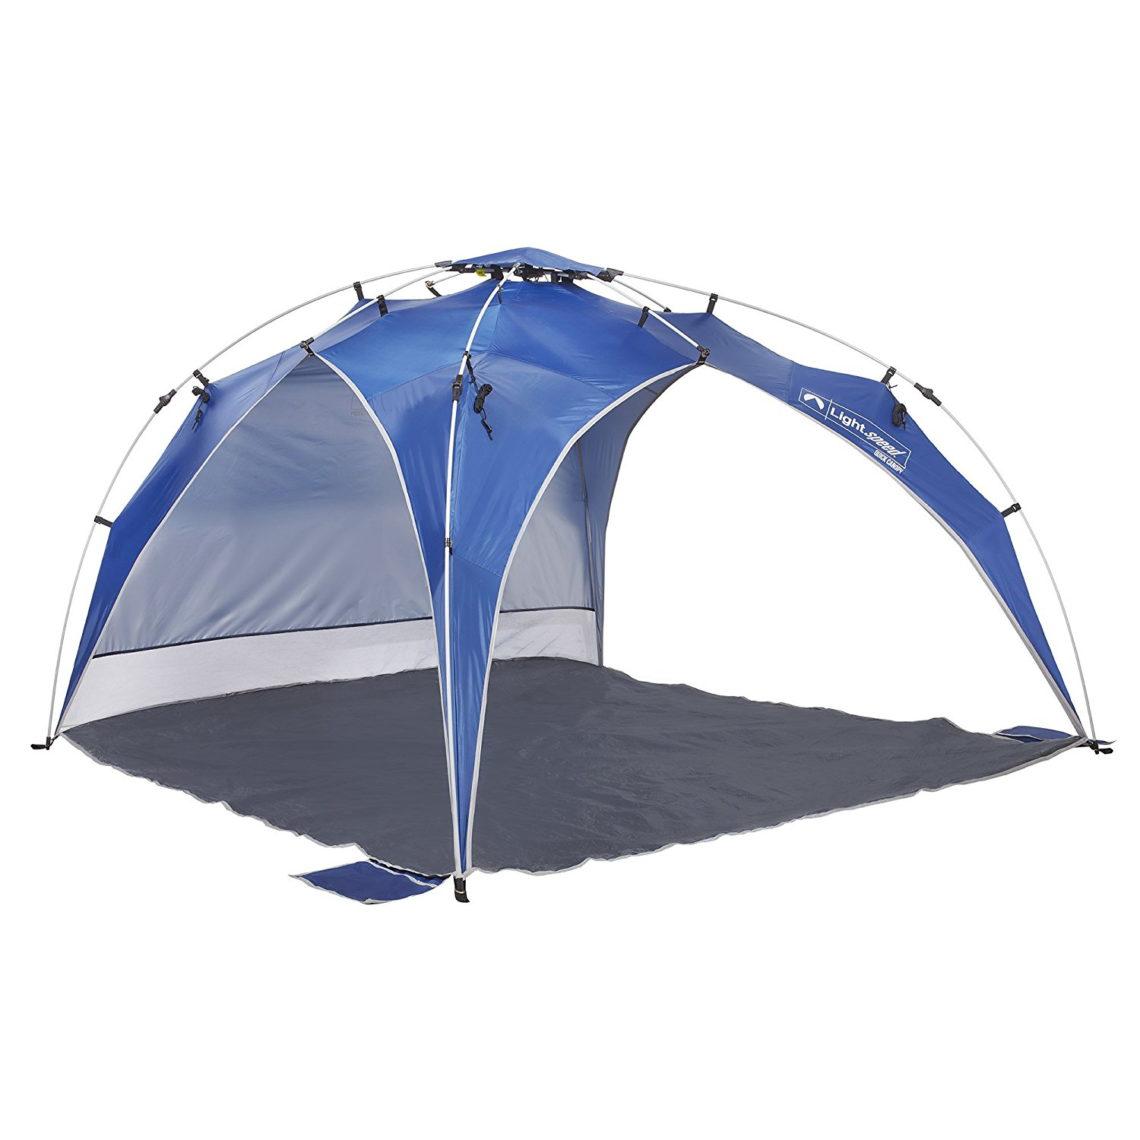 Best Beach Umbrellas Amp Canopies Outerbanks Com